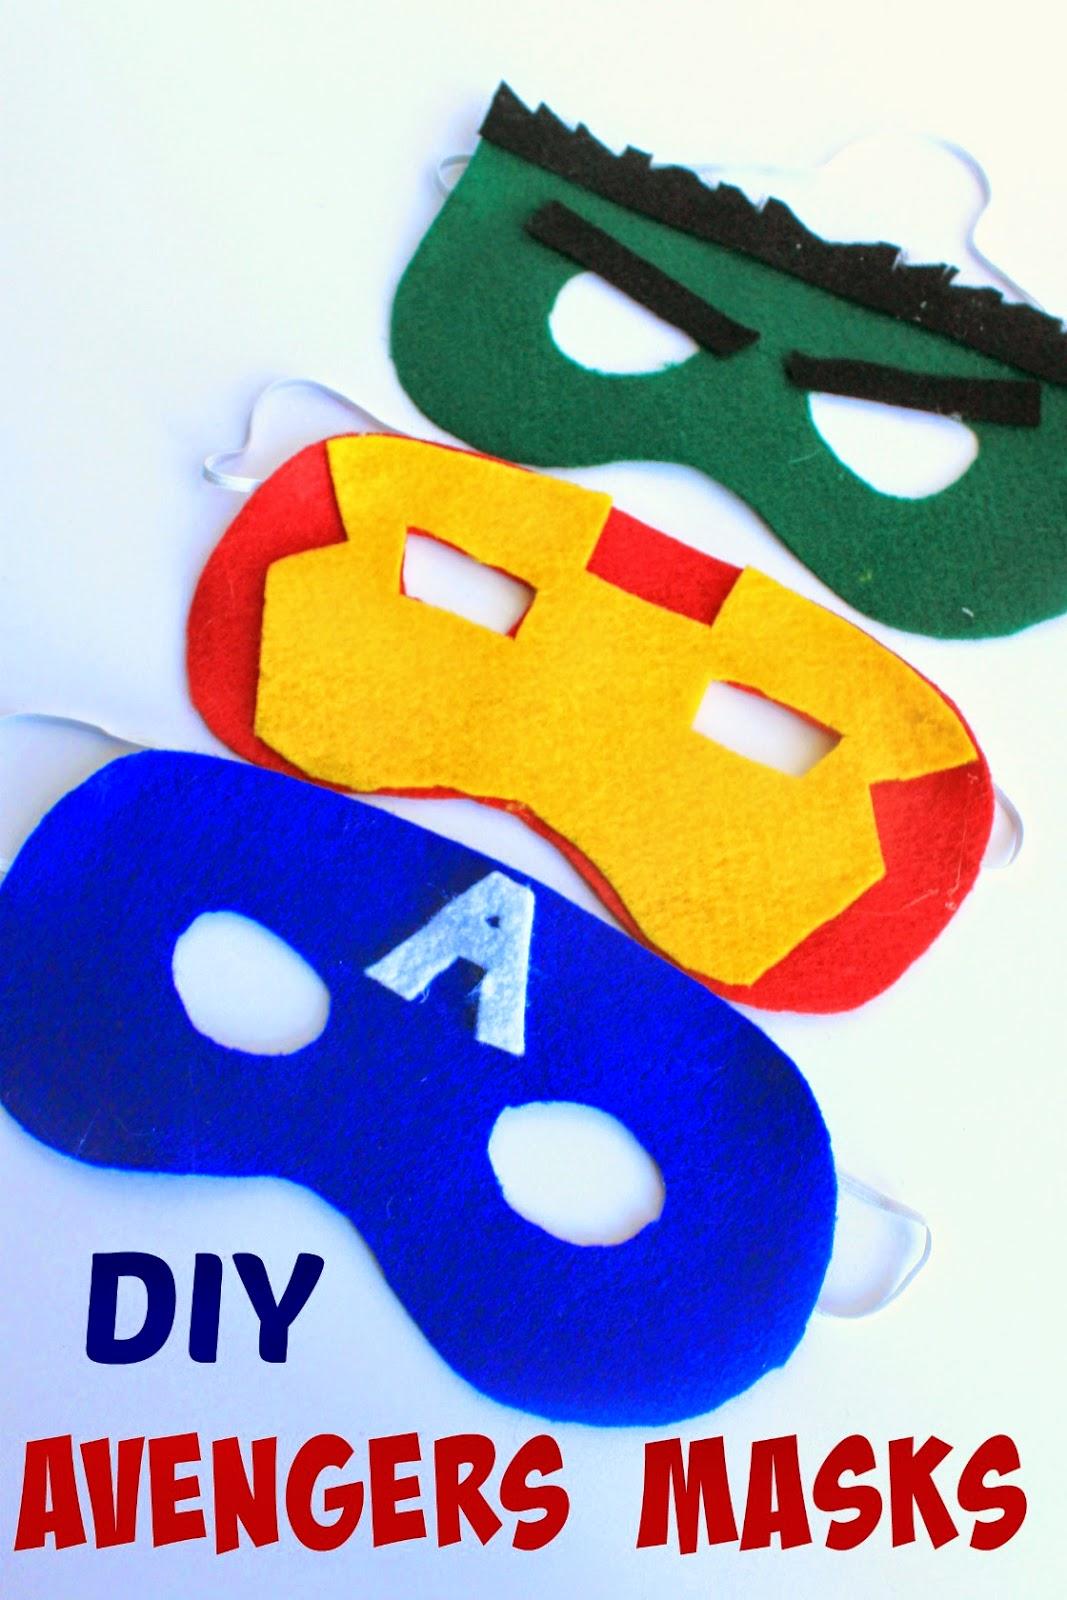 DIY Avengers Masks with patterns #AvengersUnite #ad